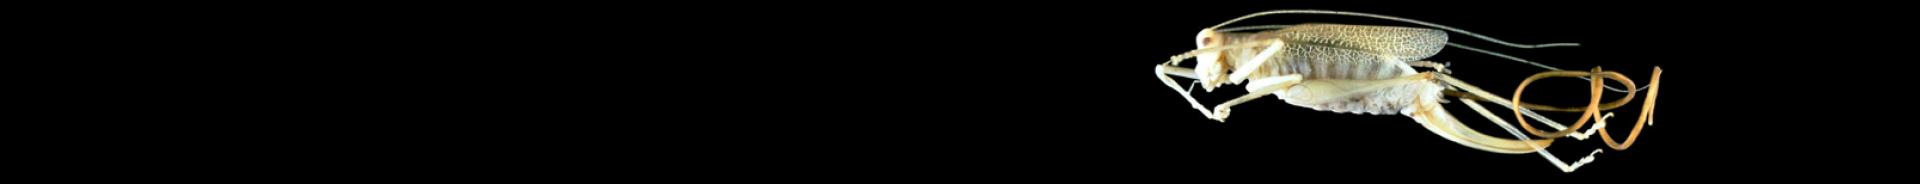 Spinochordodes tellinii